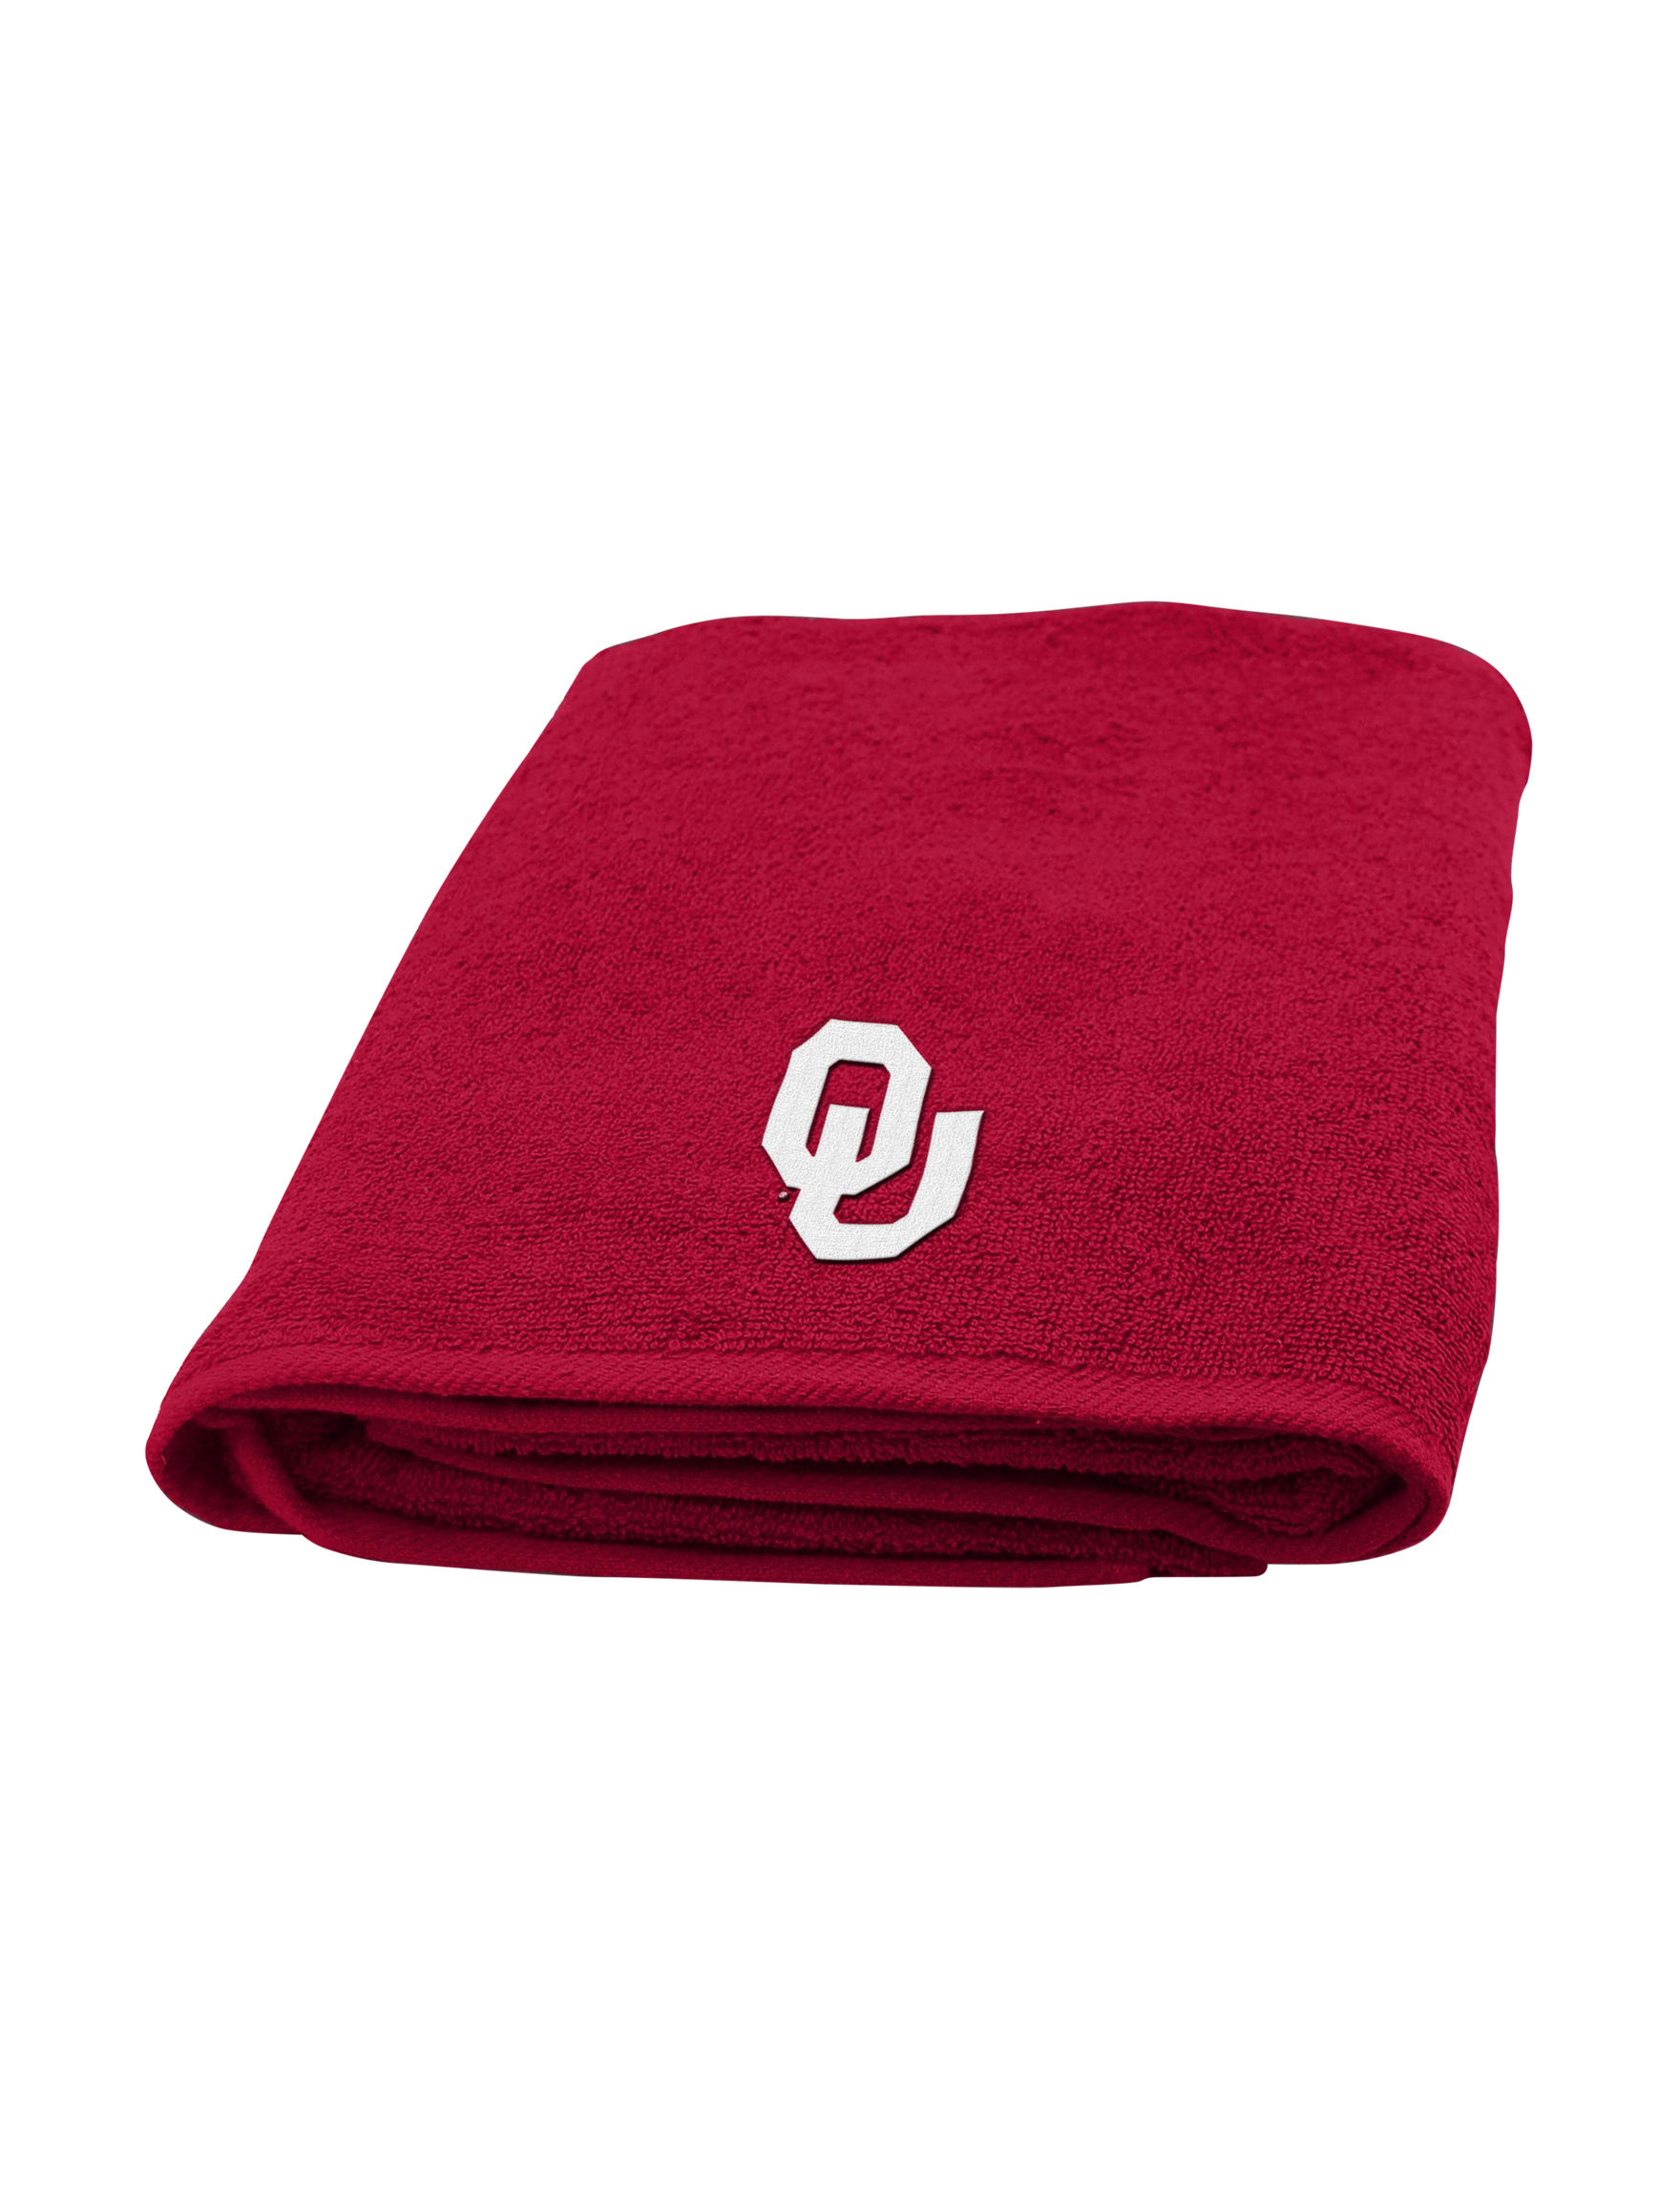 The Northwest Company Multi Bath Towels Towels